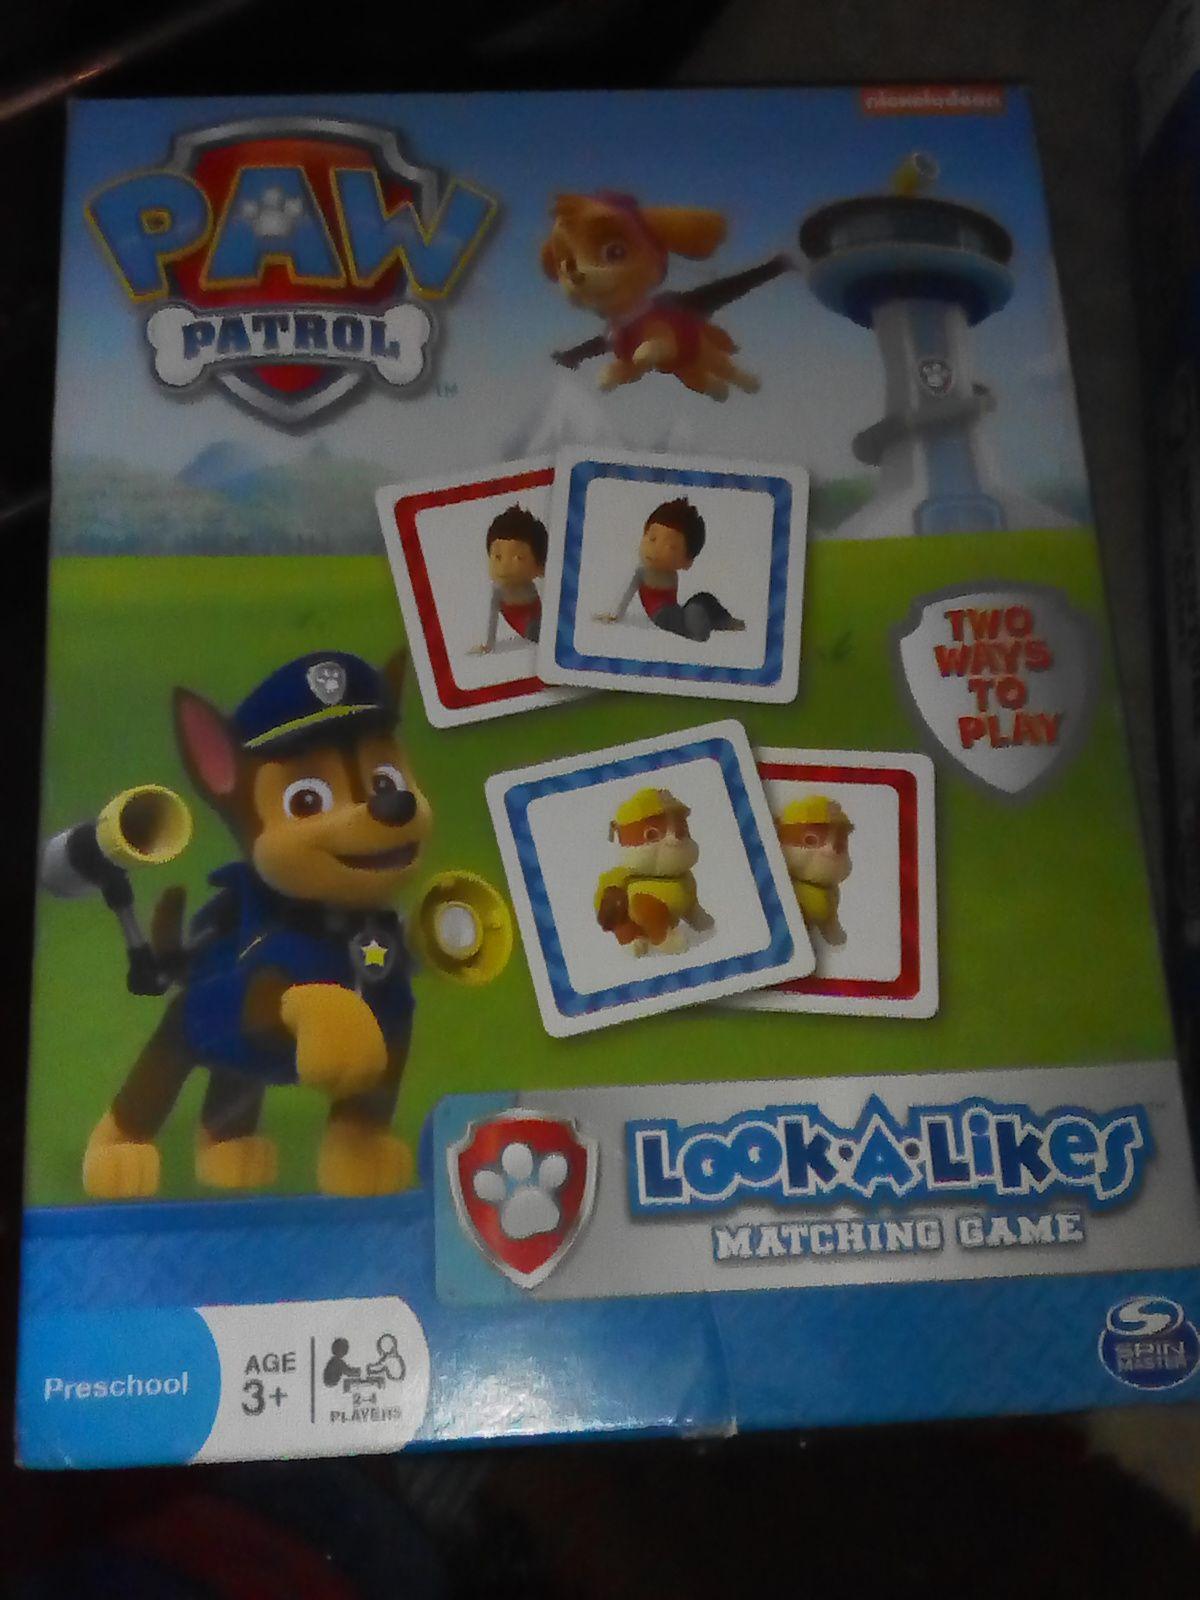 Paw patrol games